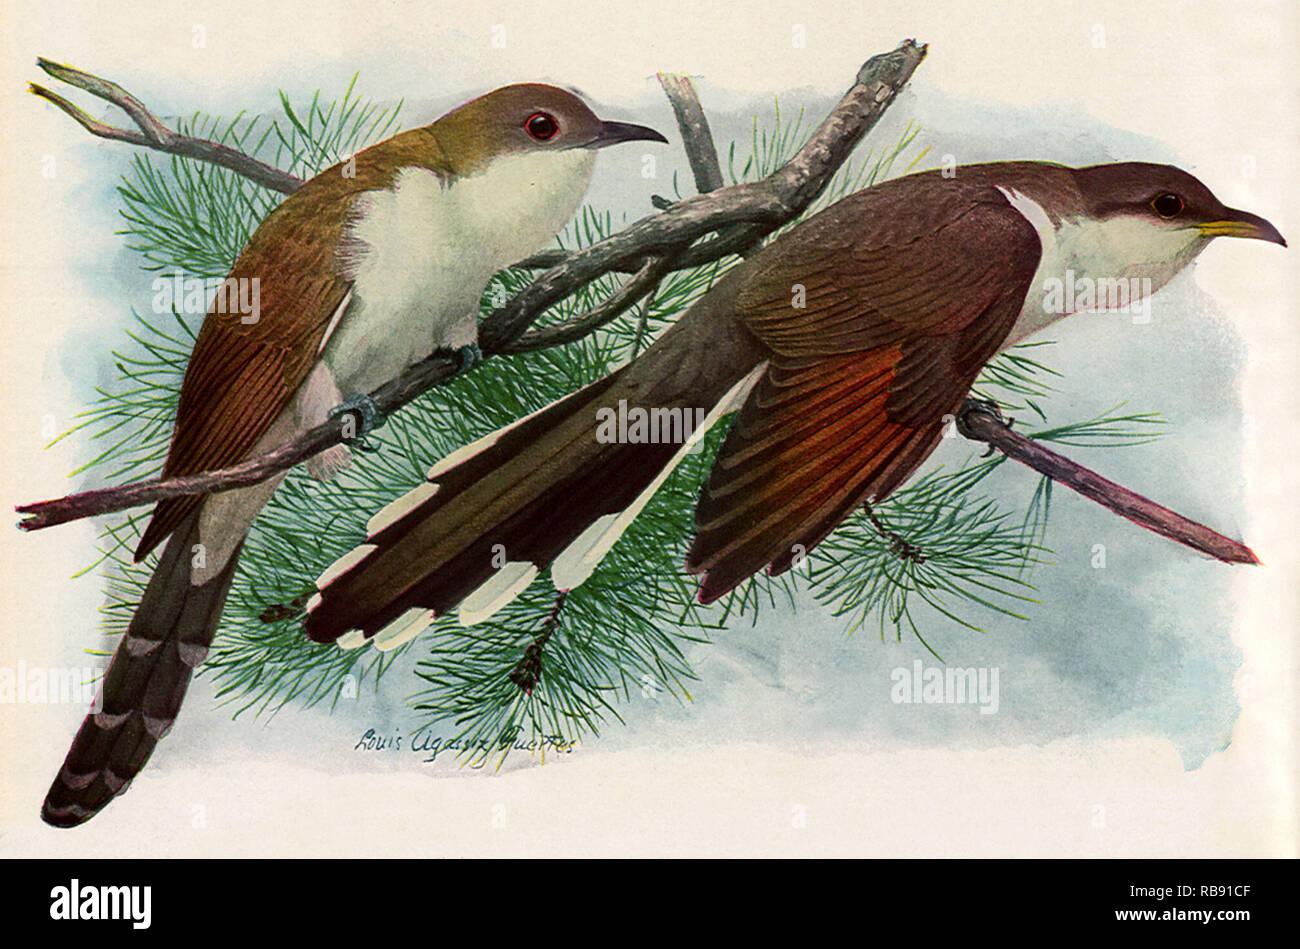 Cuckoos - Stock Image